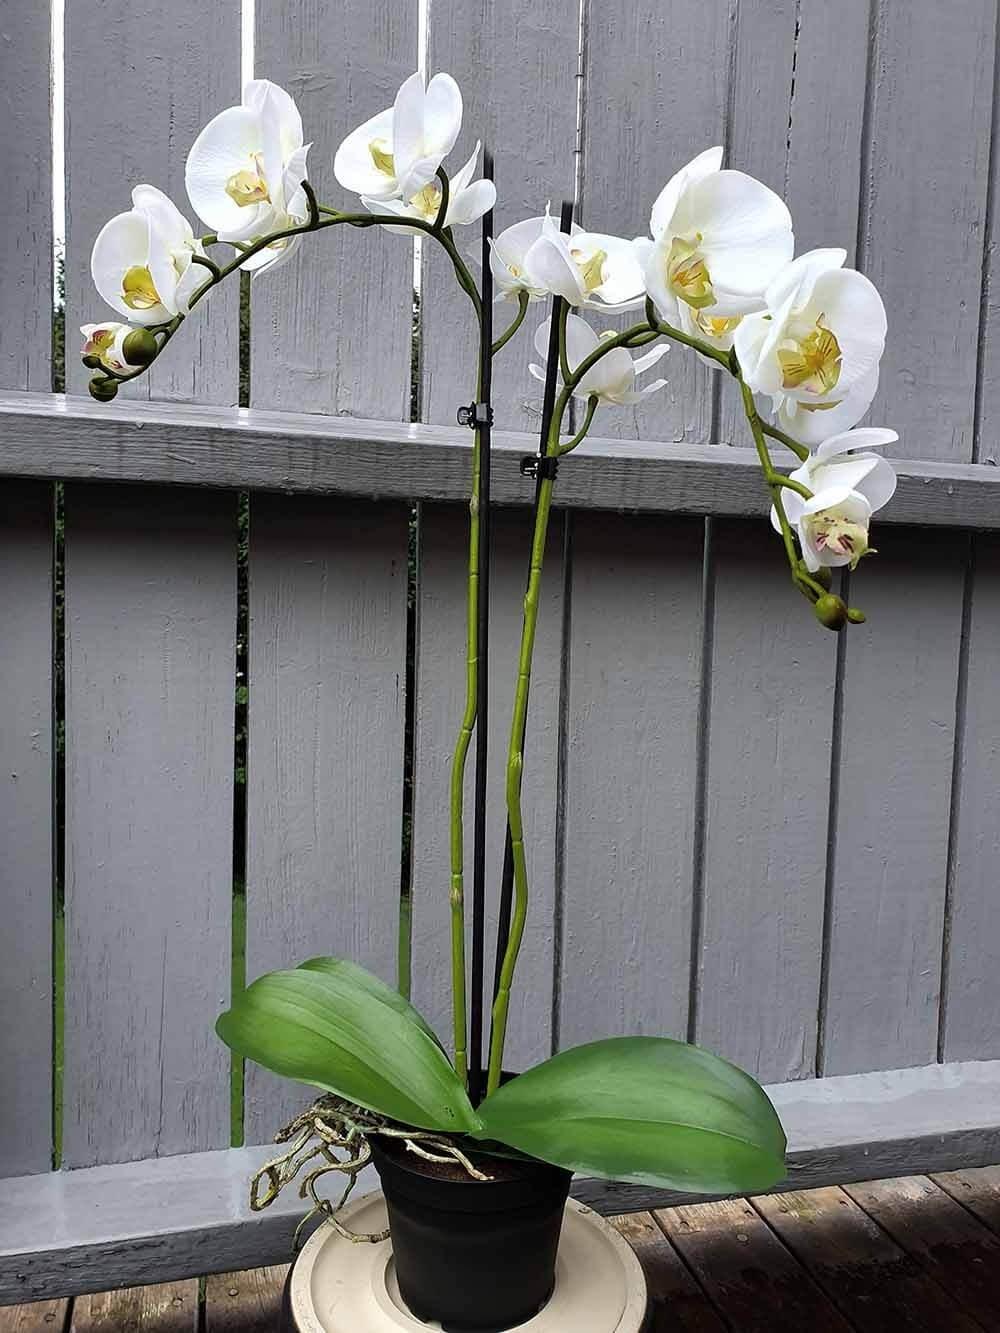 Orkidé, 2-stängel, vit, konstgjord